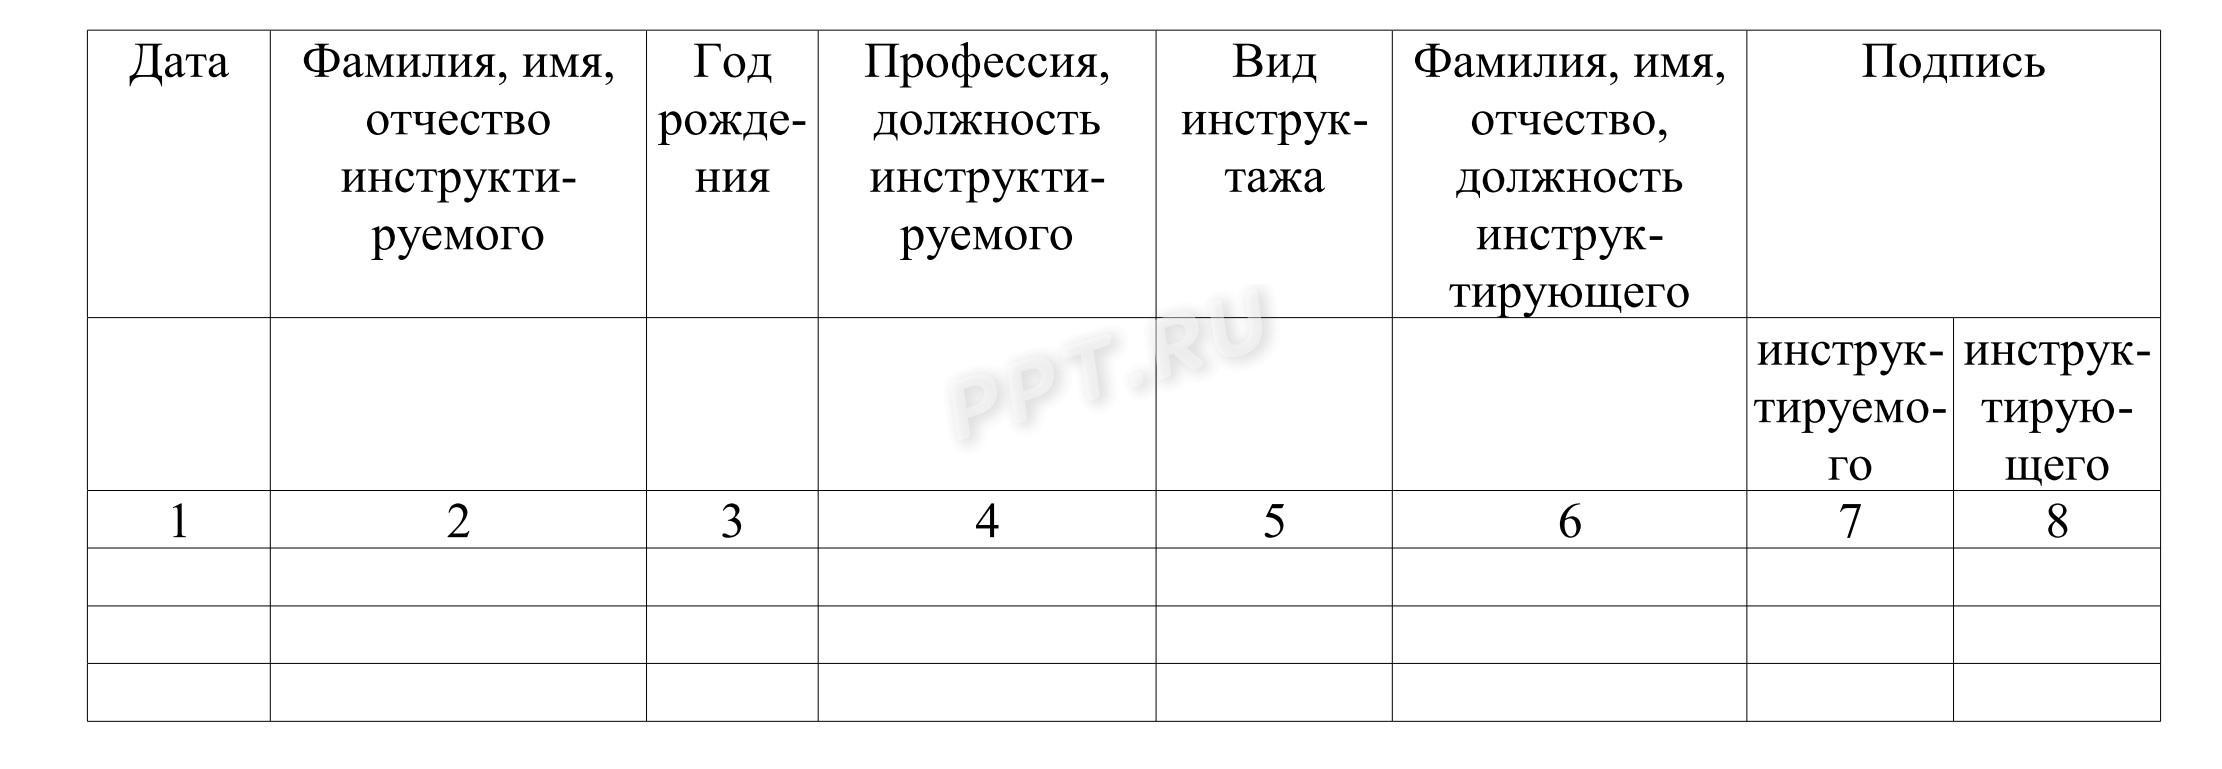 Журнал инструктажей